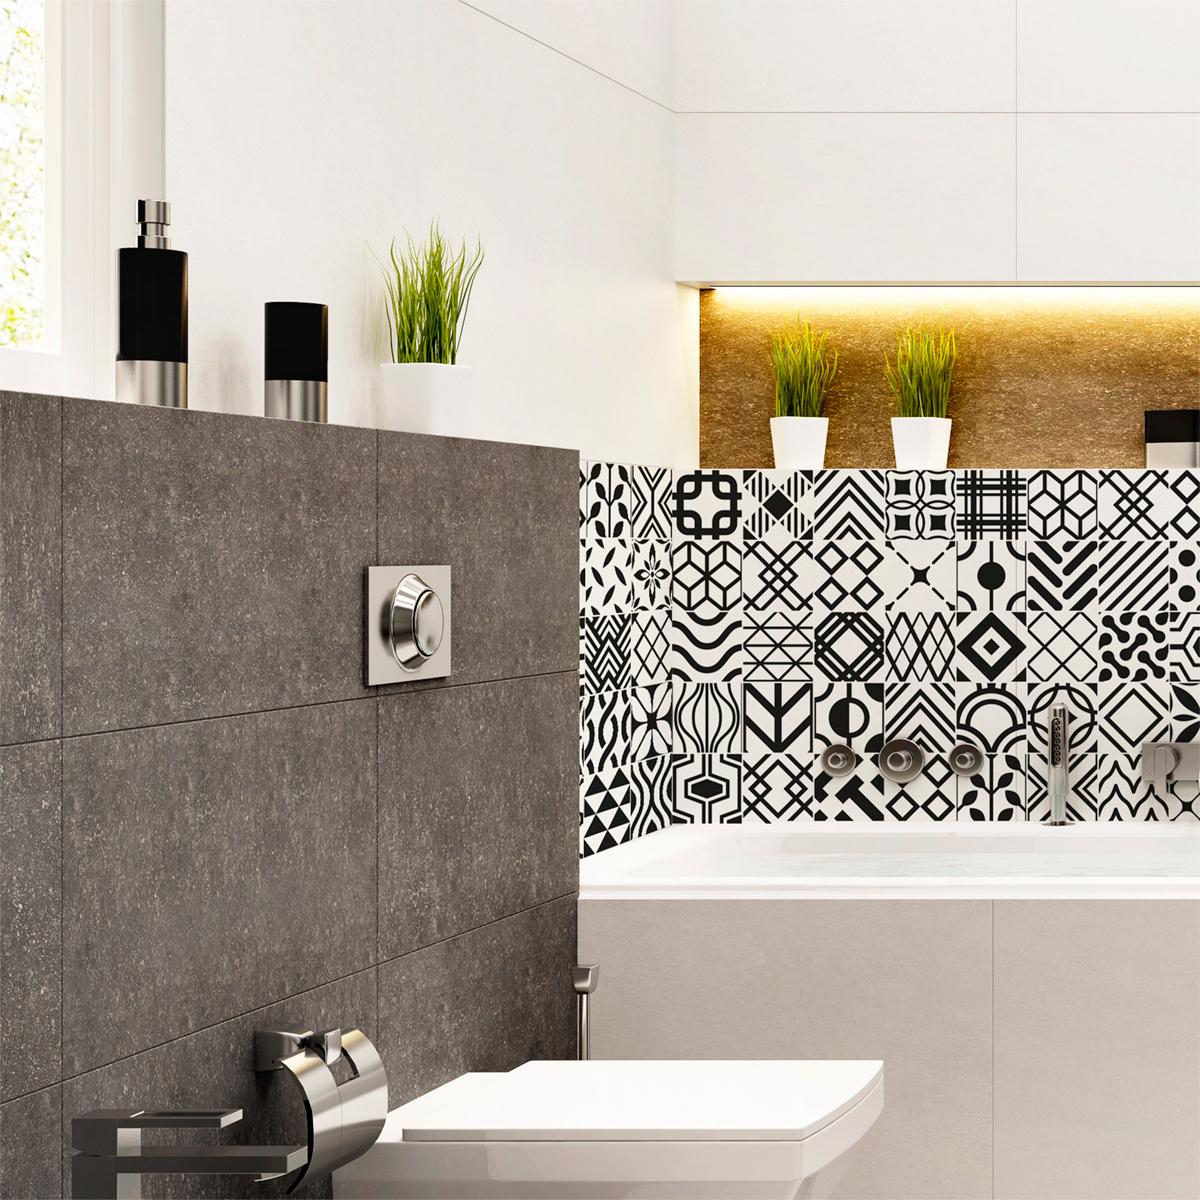 60 stickers carrelages scandinave danemark salle de bain et wc salle de bain ambiance sticker. Black Bedroom Furniture Sets. Home Design Ideas